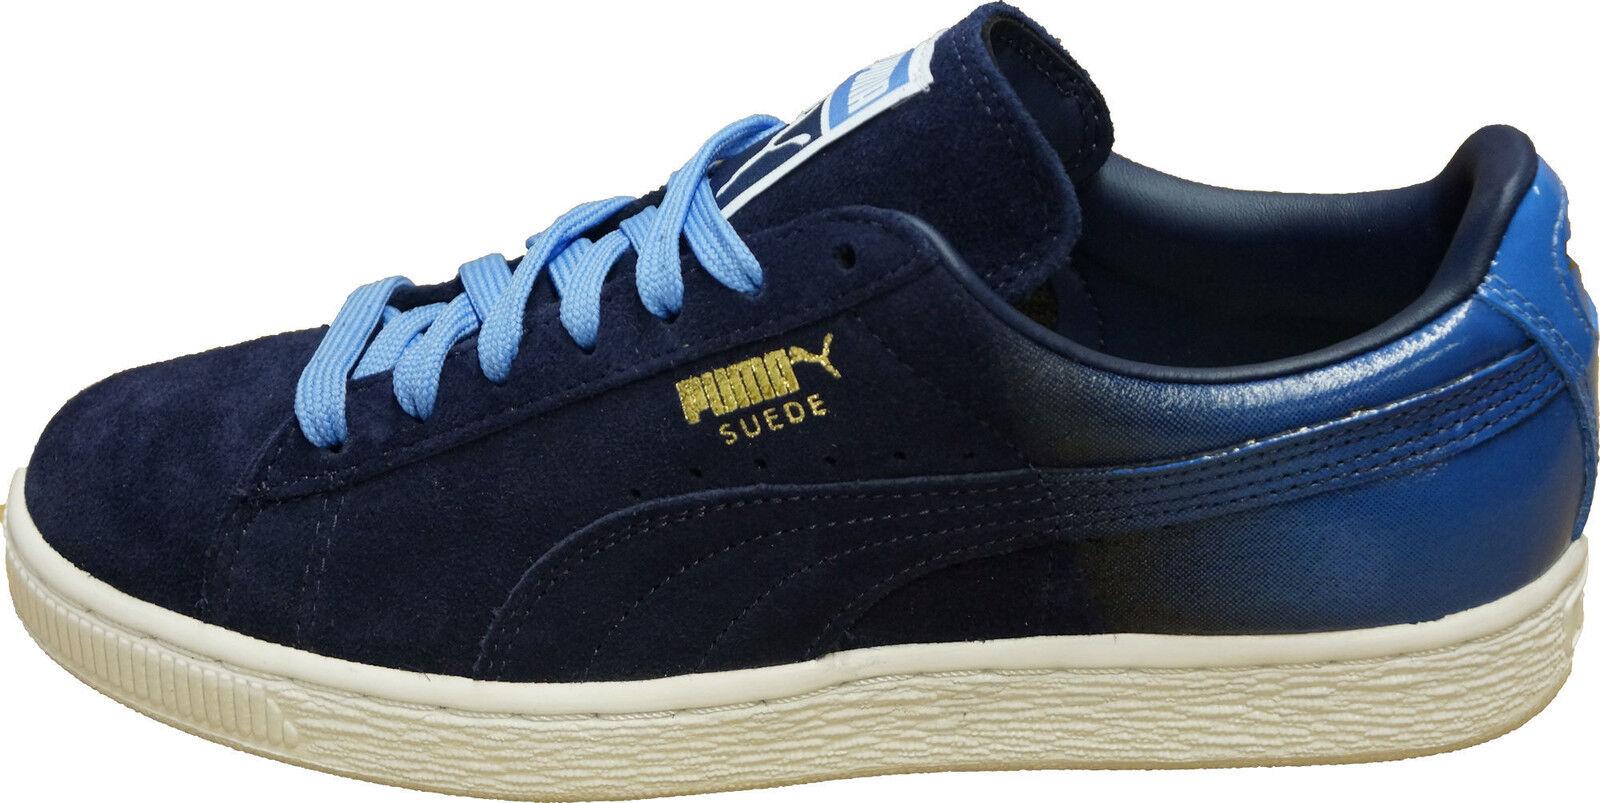 Puma - scamosciato classico + macchia donne edizione limitata - Puma giacca blu marina bianchi 1d5fbf